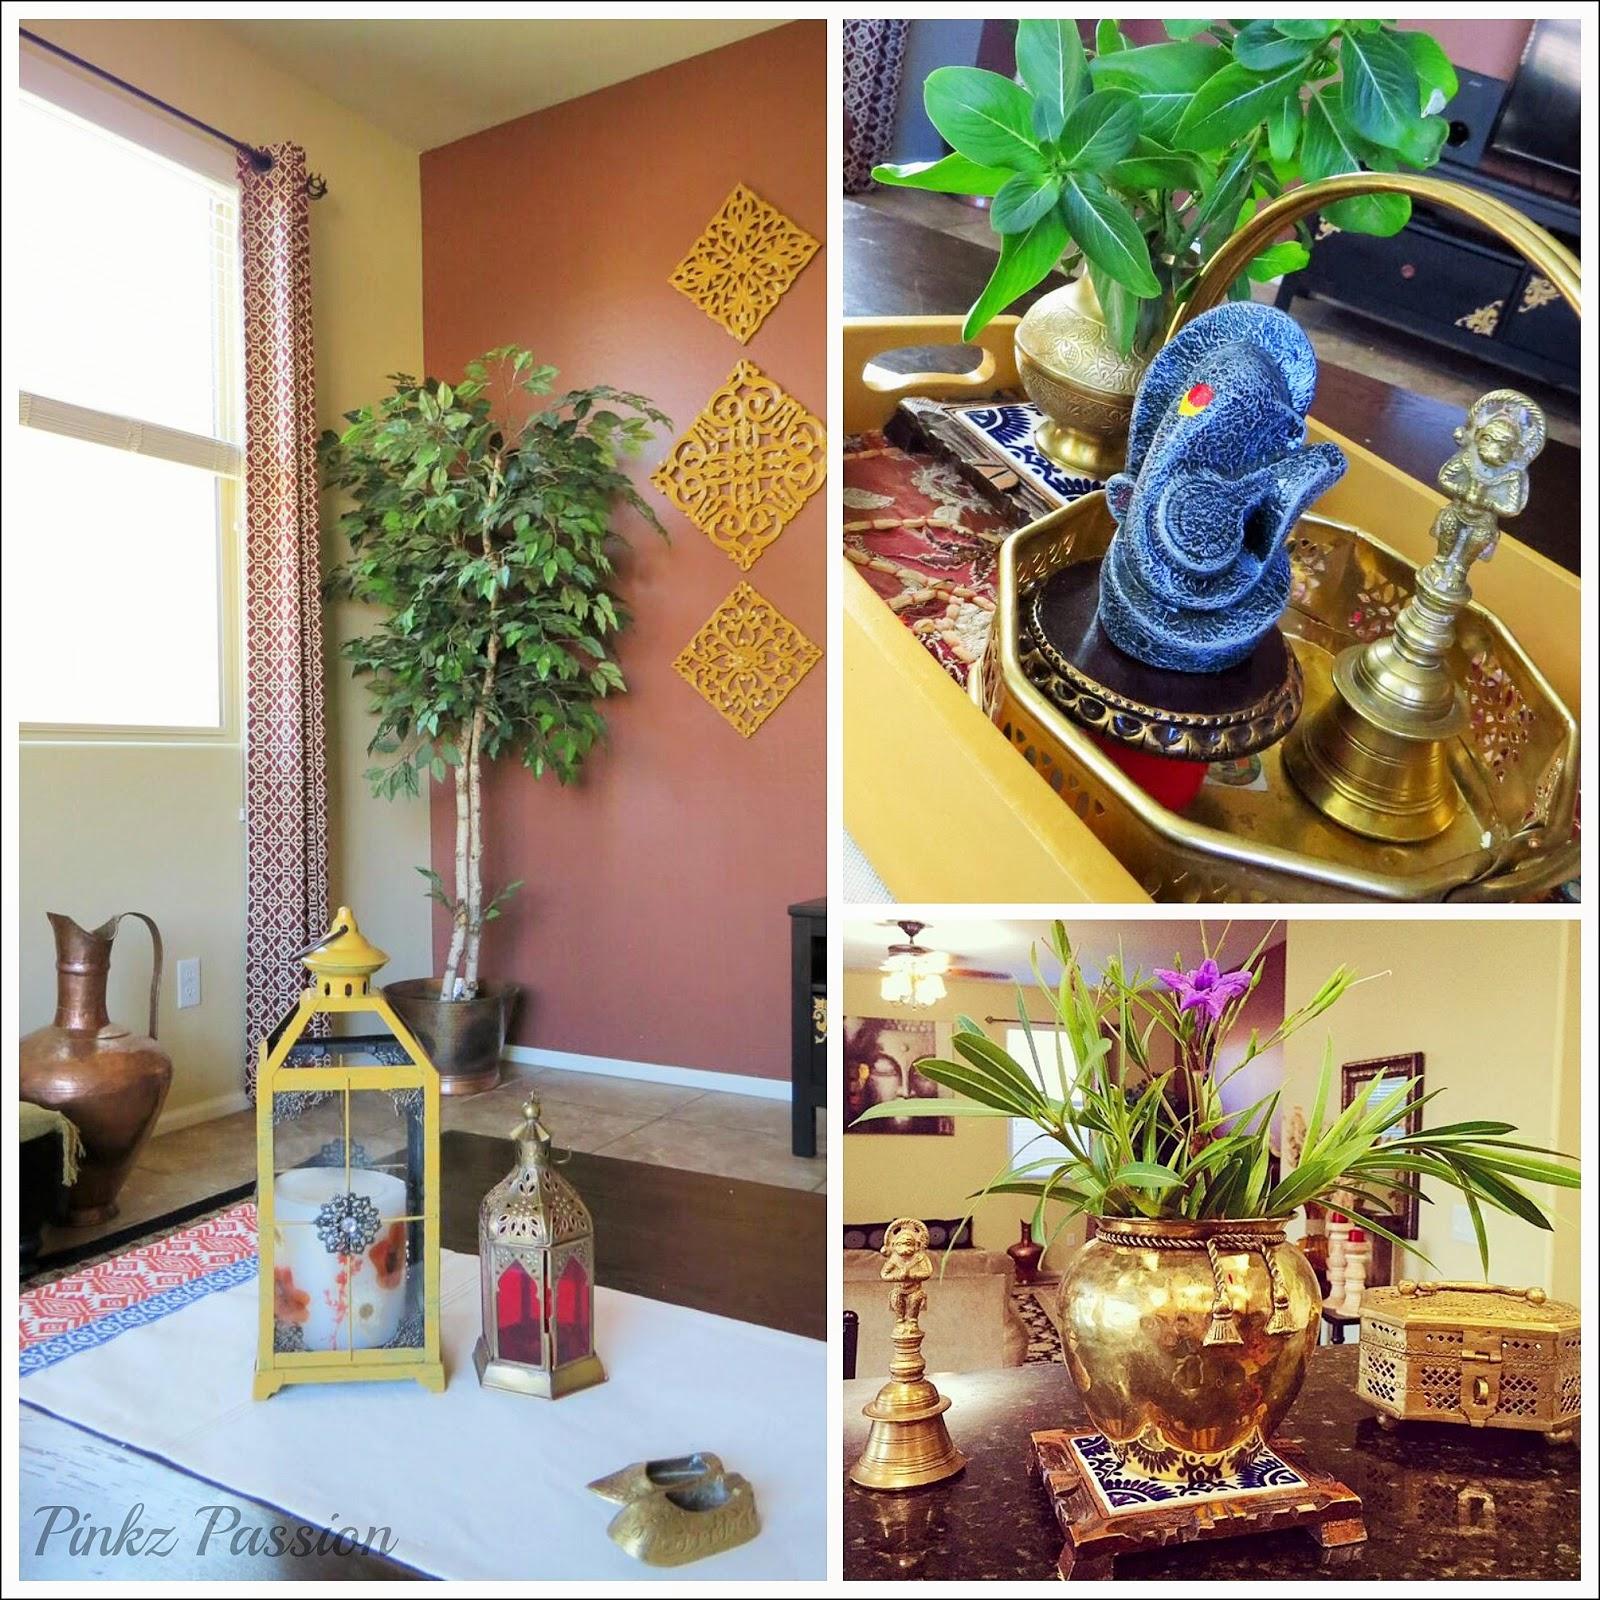 Diy Home Decor Indian Style Tutorial: Brass Vignettes, DIY Furniture Makeovers, Global Décor